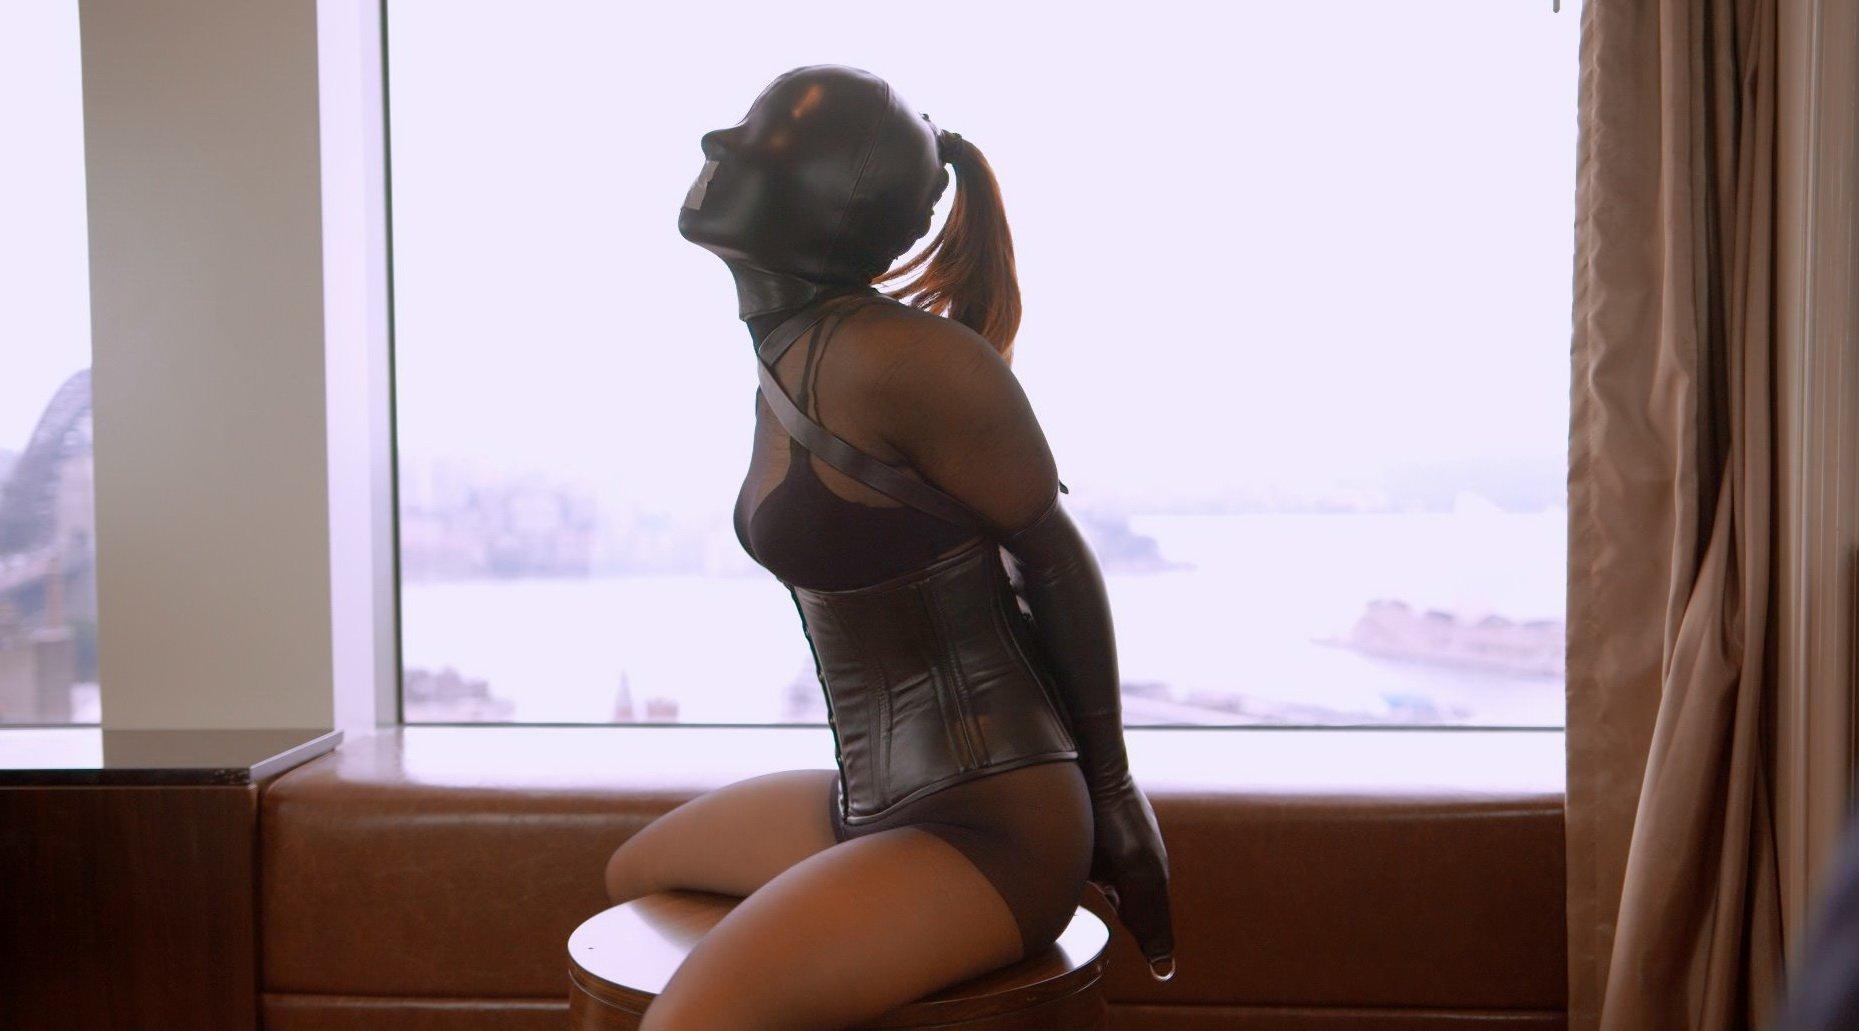 Women spanking men porn sites